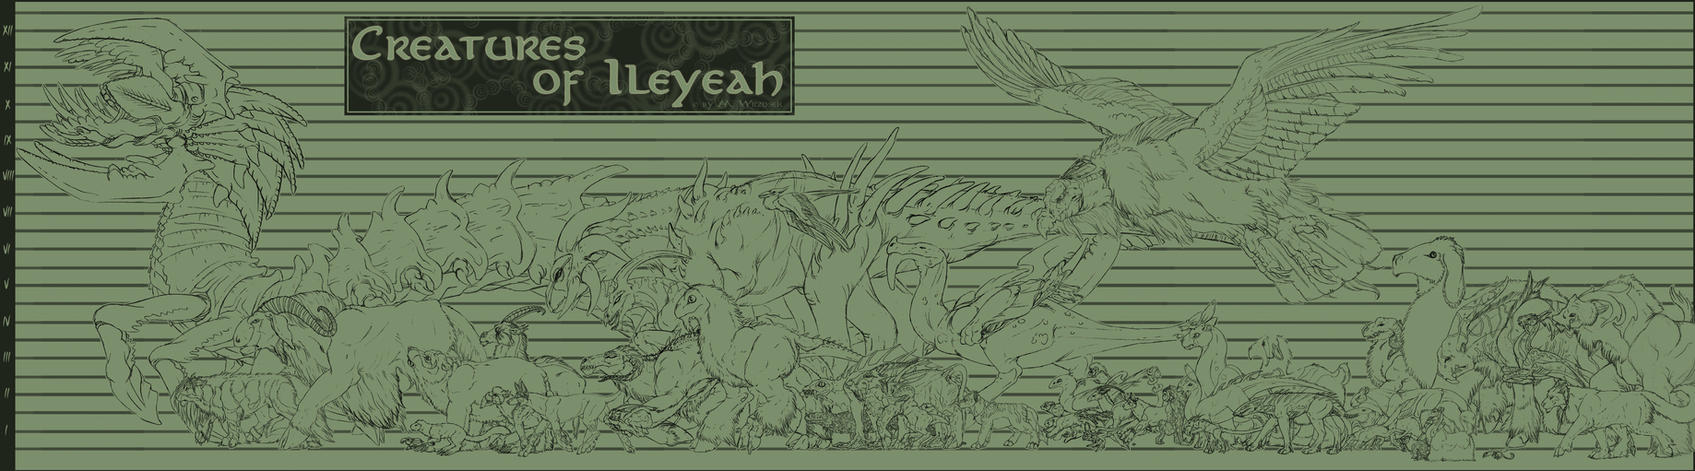 Creatures of Ileyeah by BloodhoundOmega